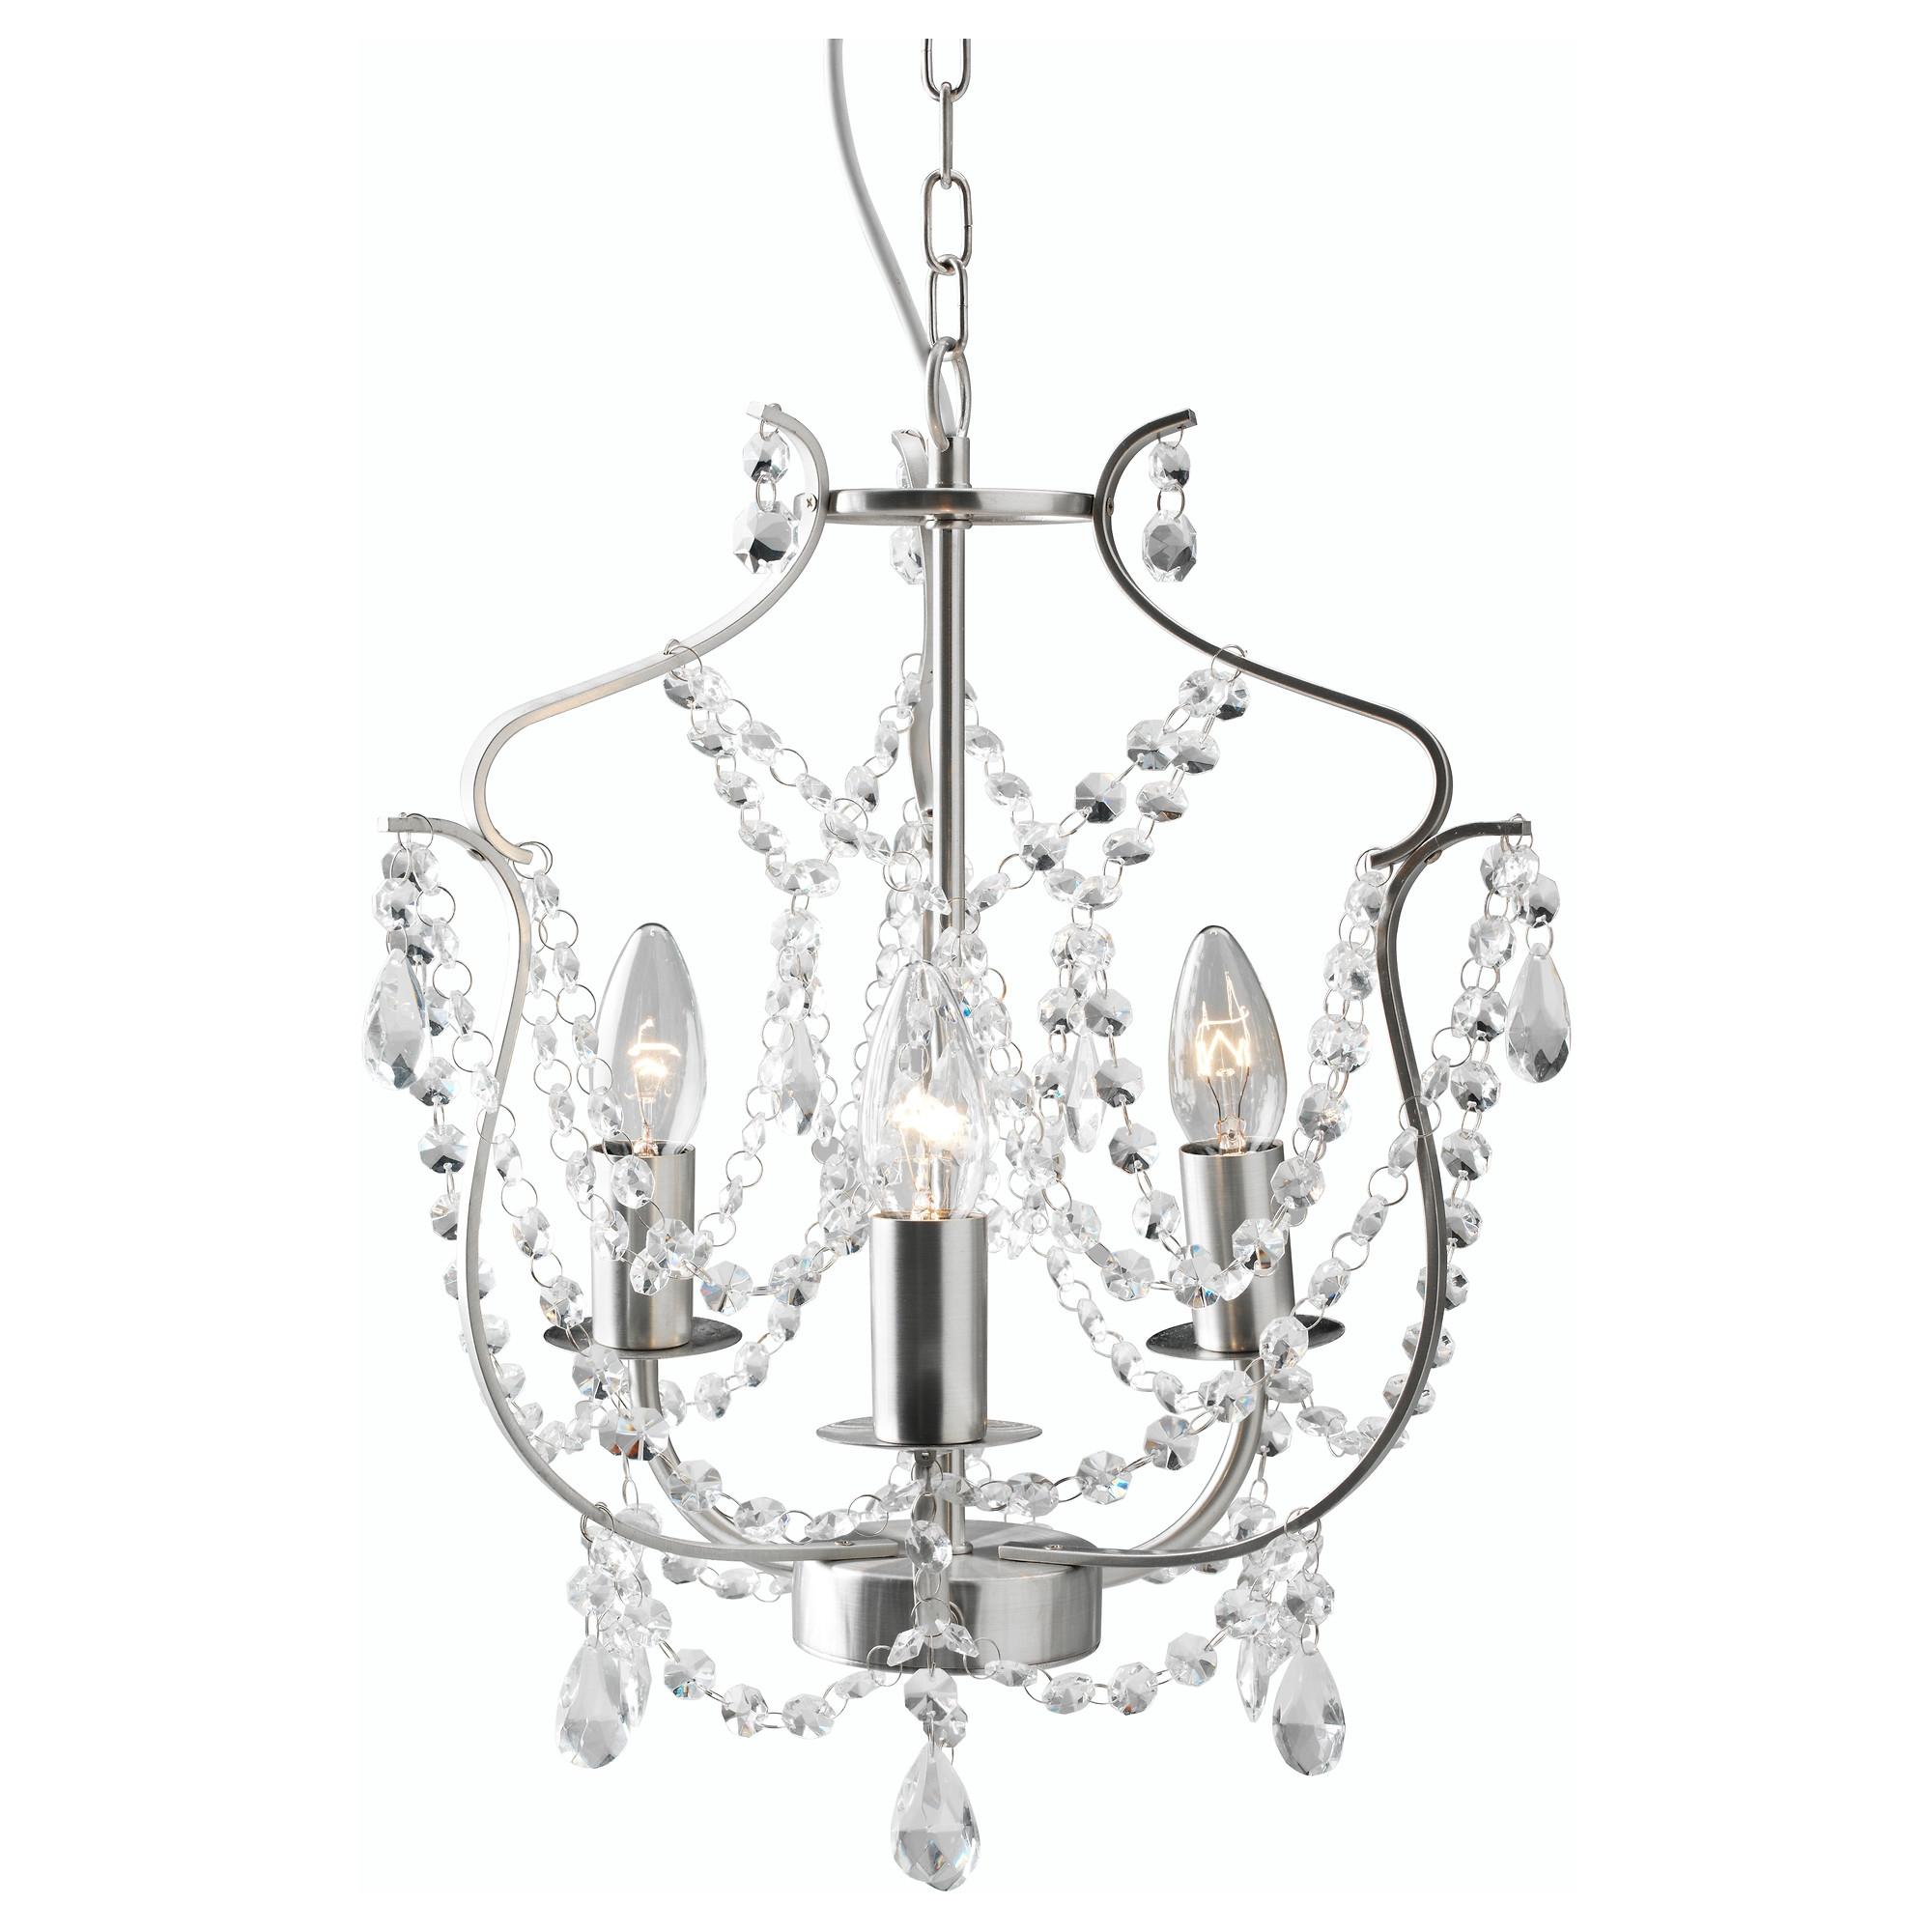 KRISTALLER chandelier, 3-armed